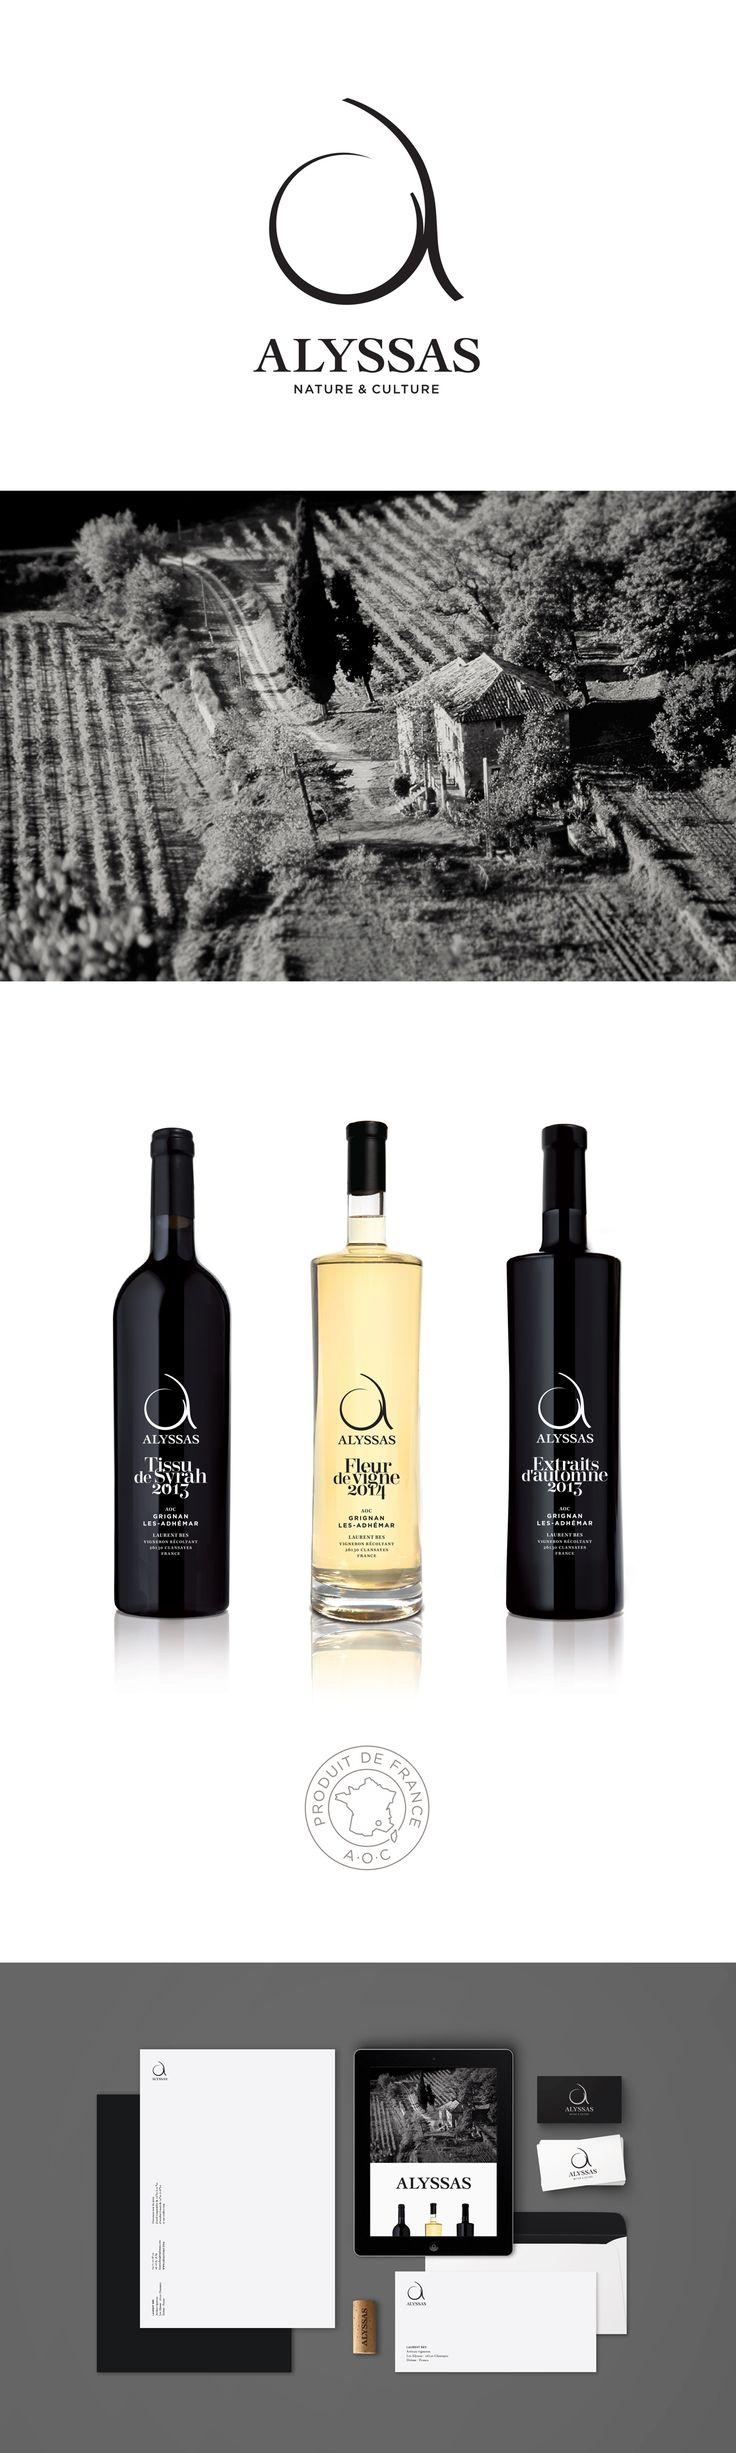 Alyssas | Studio Cosmos | 2015 #vin, #terroir, #logo, #création, #packaging, #graphicdesign, #wine, #france